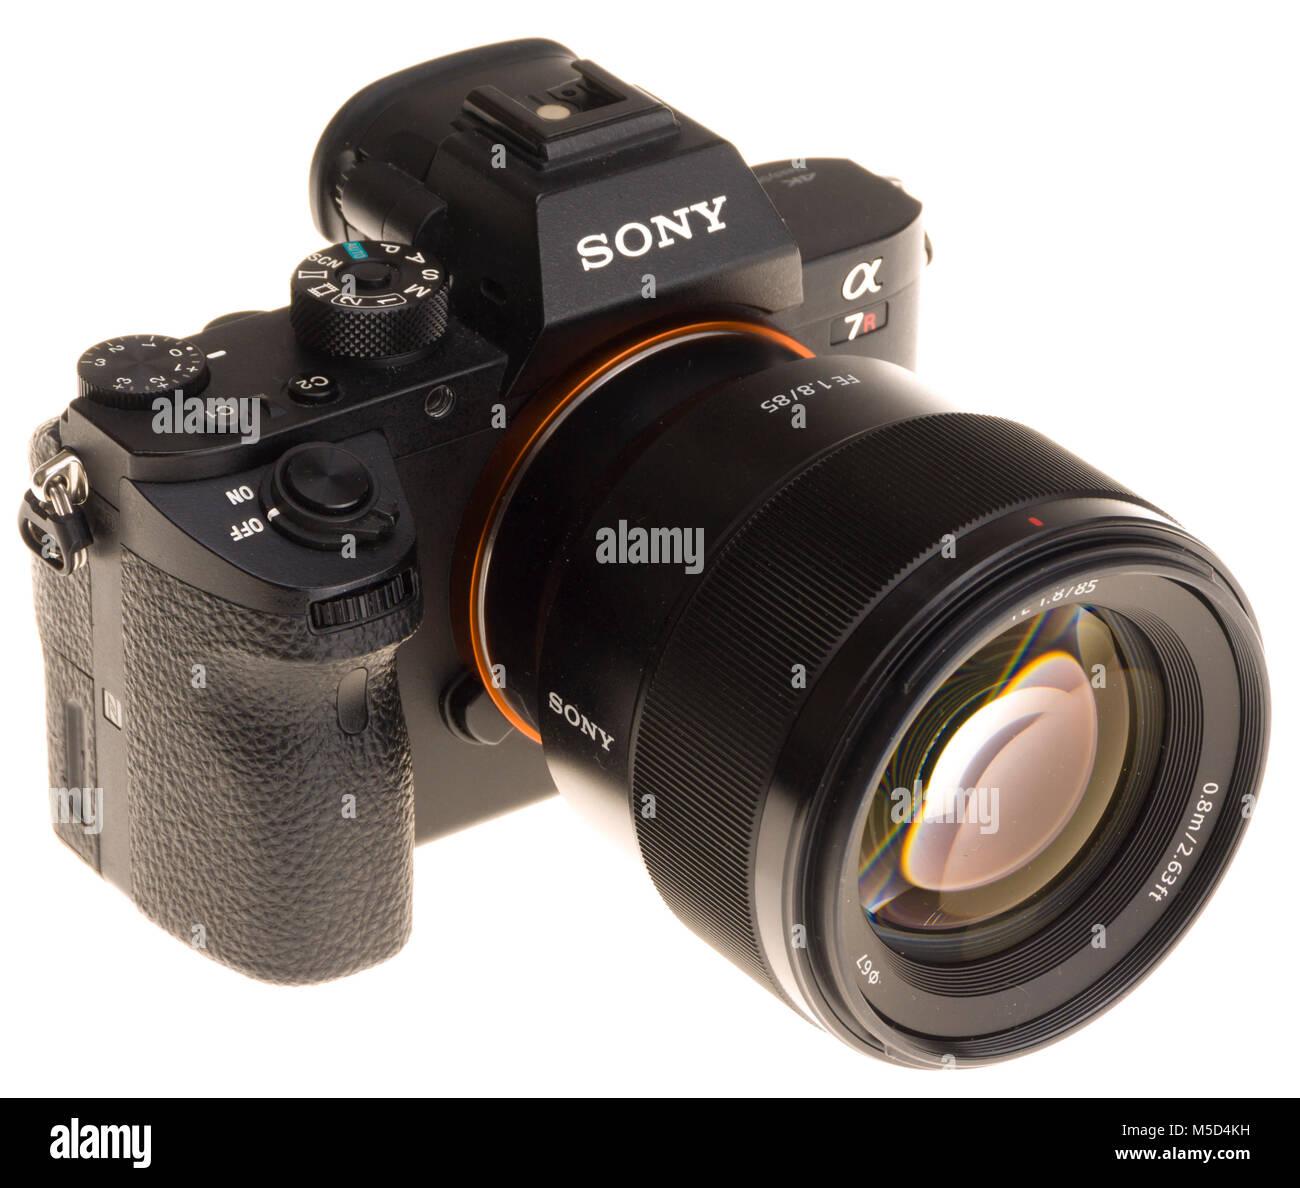 Sony Profesional cámara mirrorless de fotograma completo con 85mm f ...